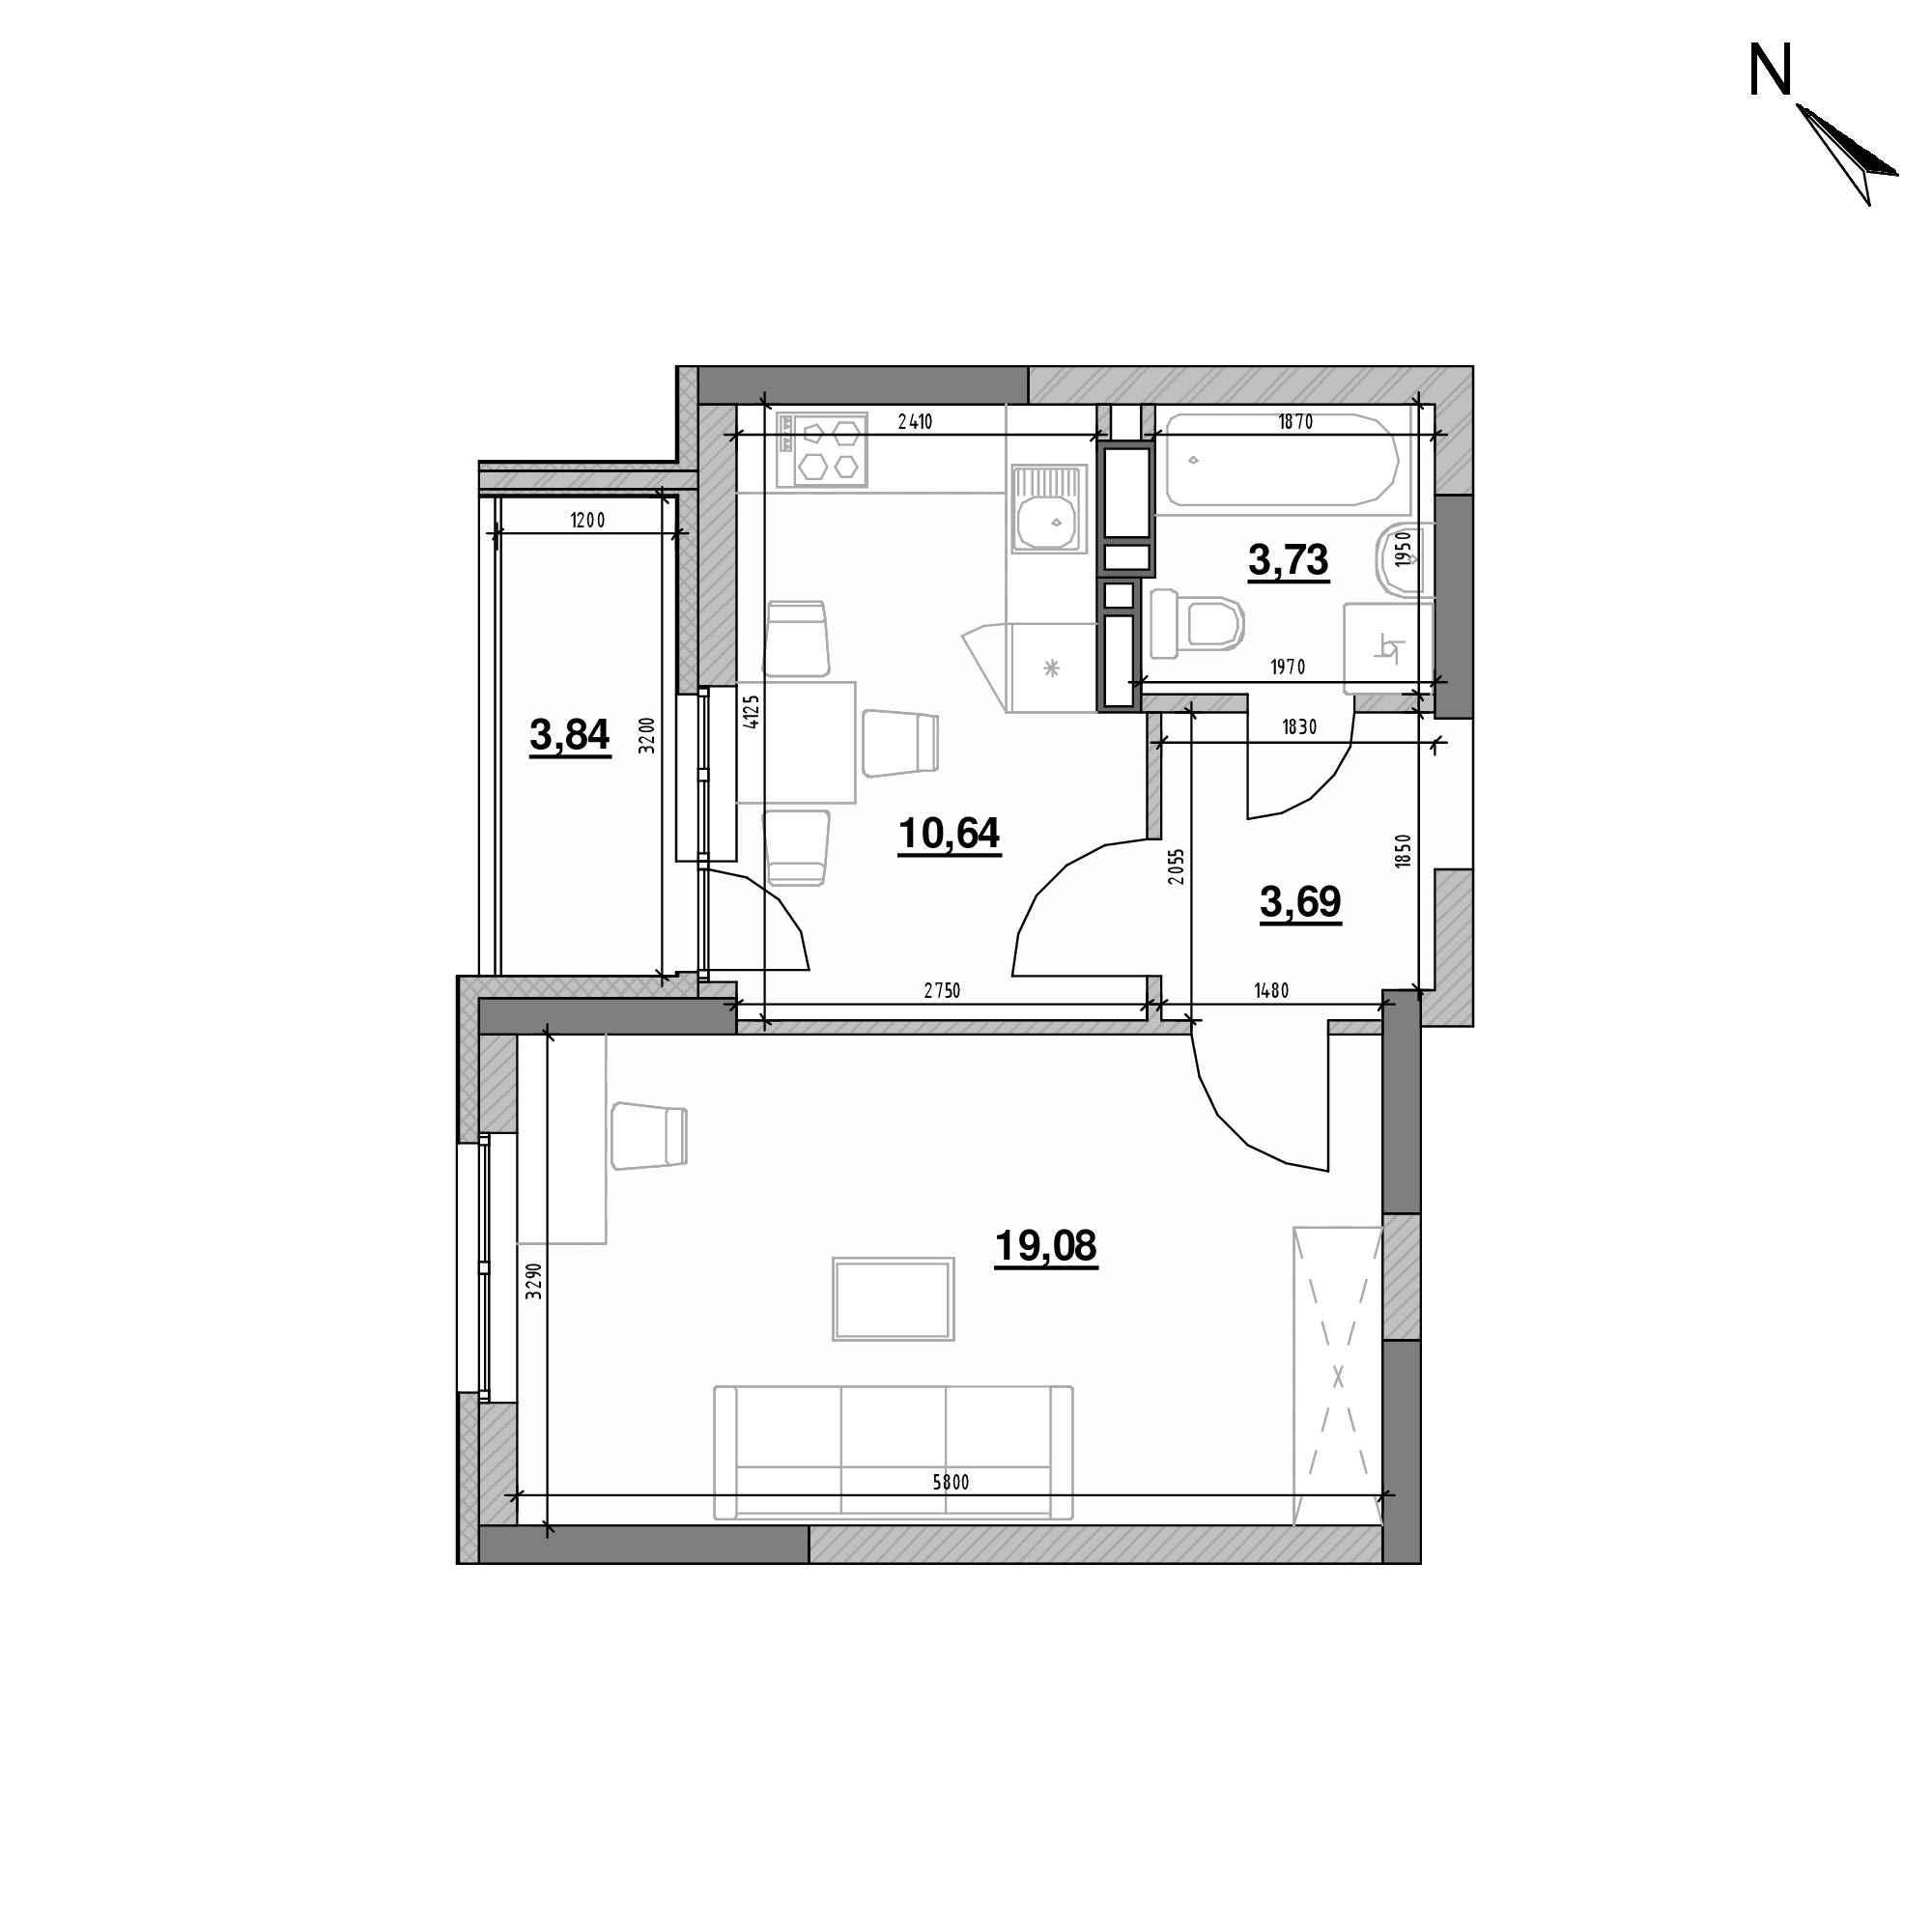 ЖК Оk'Land: планування 1-кімнатної квартири, №164, 40.98 м<sup>2</sup>